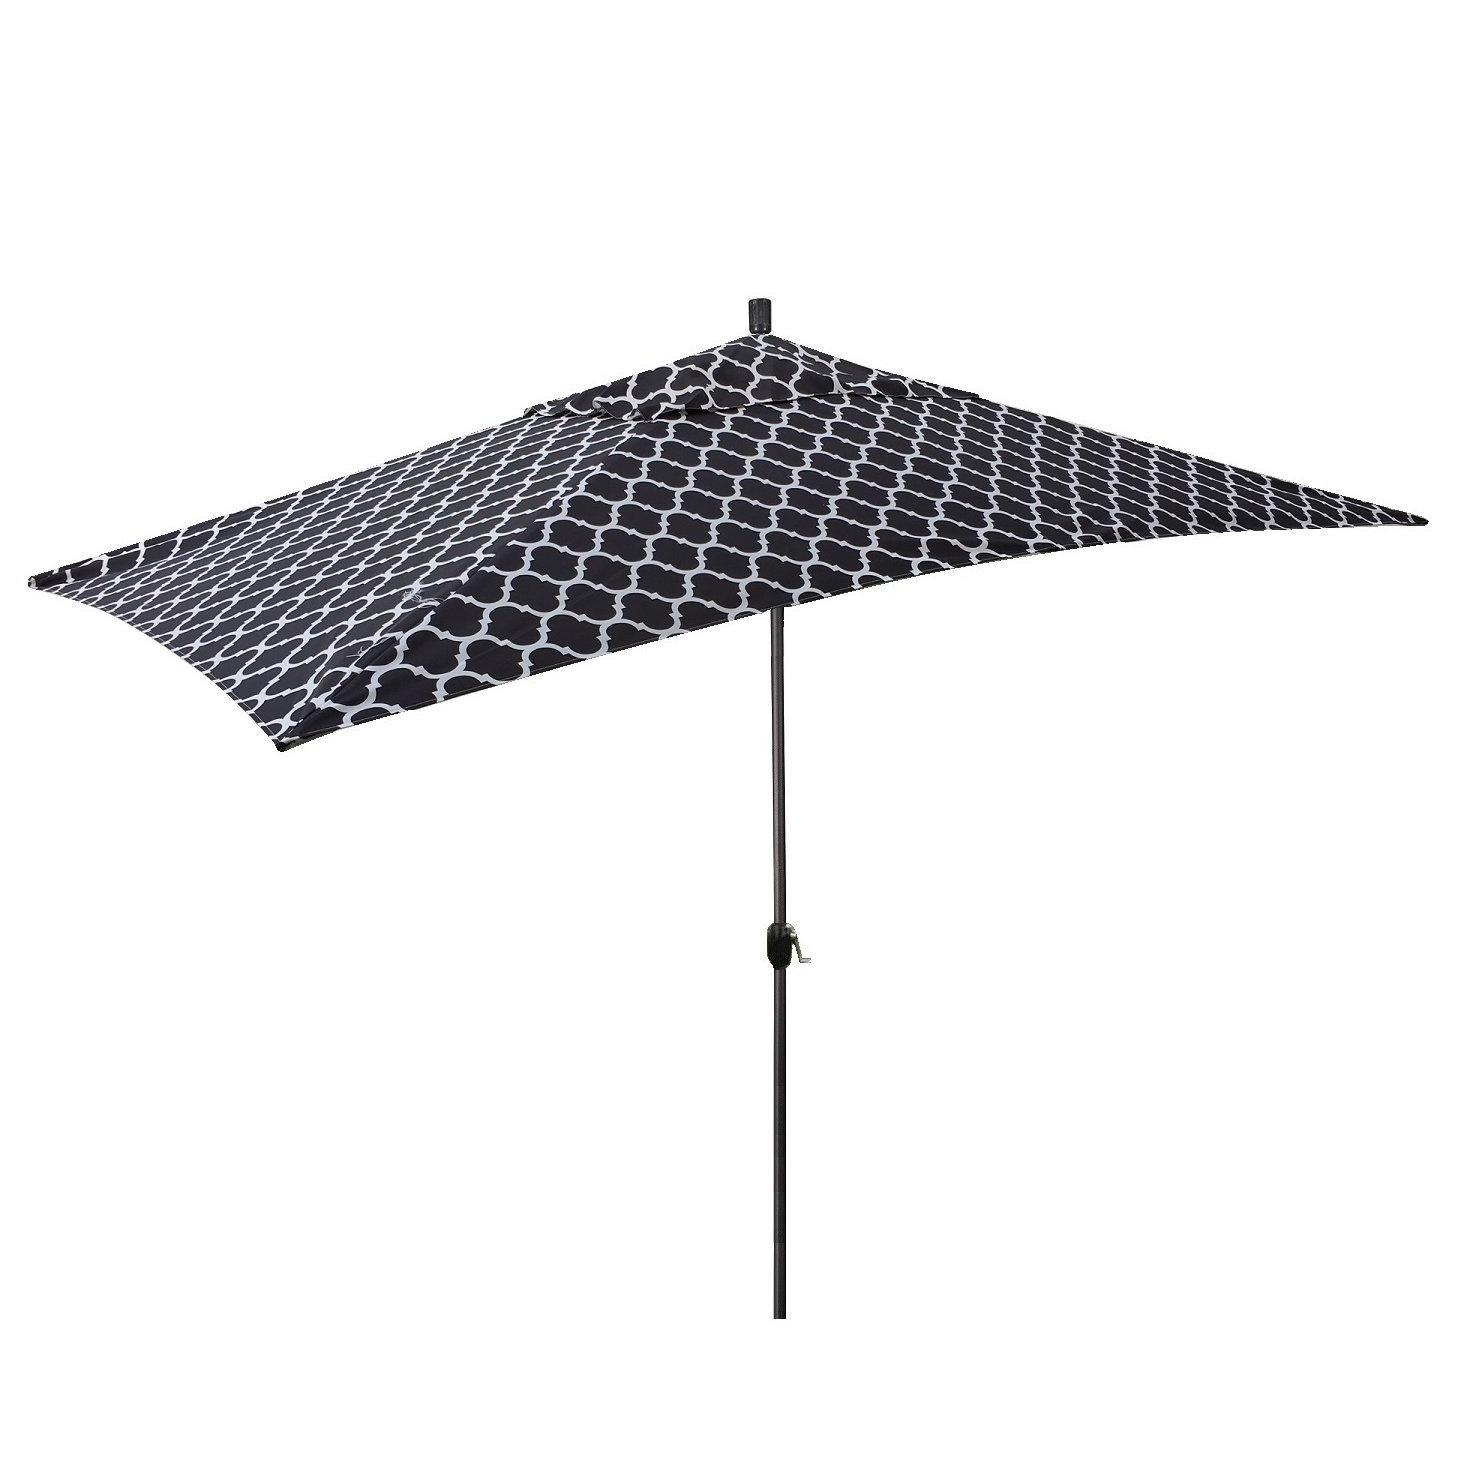 Famous Sherlyn 10' X 6' Rectangular Market Umbrella For Lonoke Patio Rectangular Market Umbrellas (View 4 of 20)